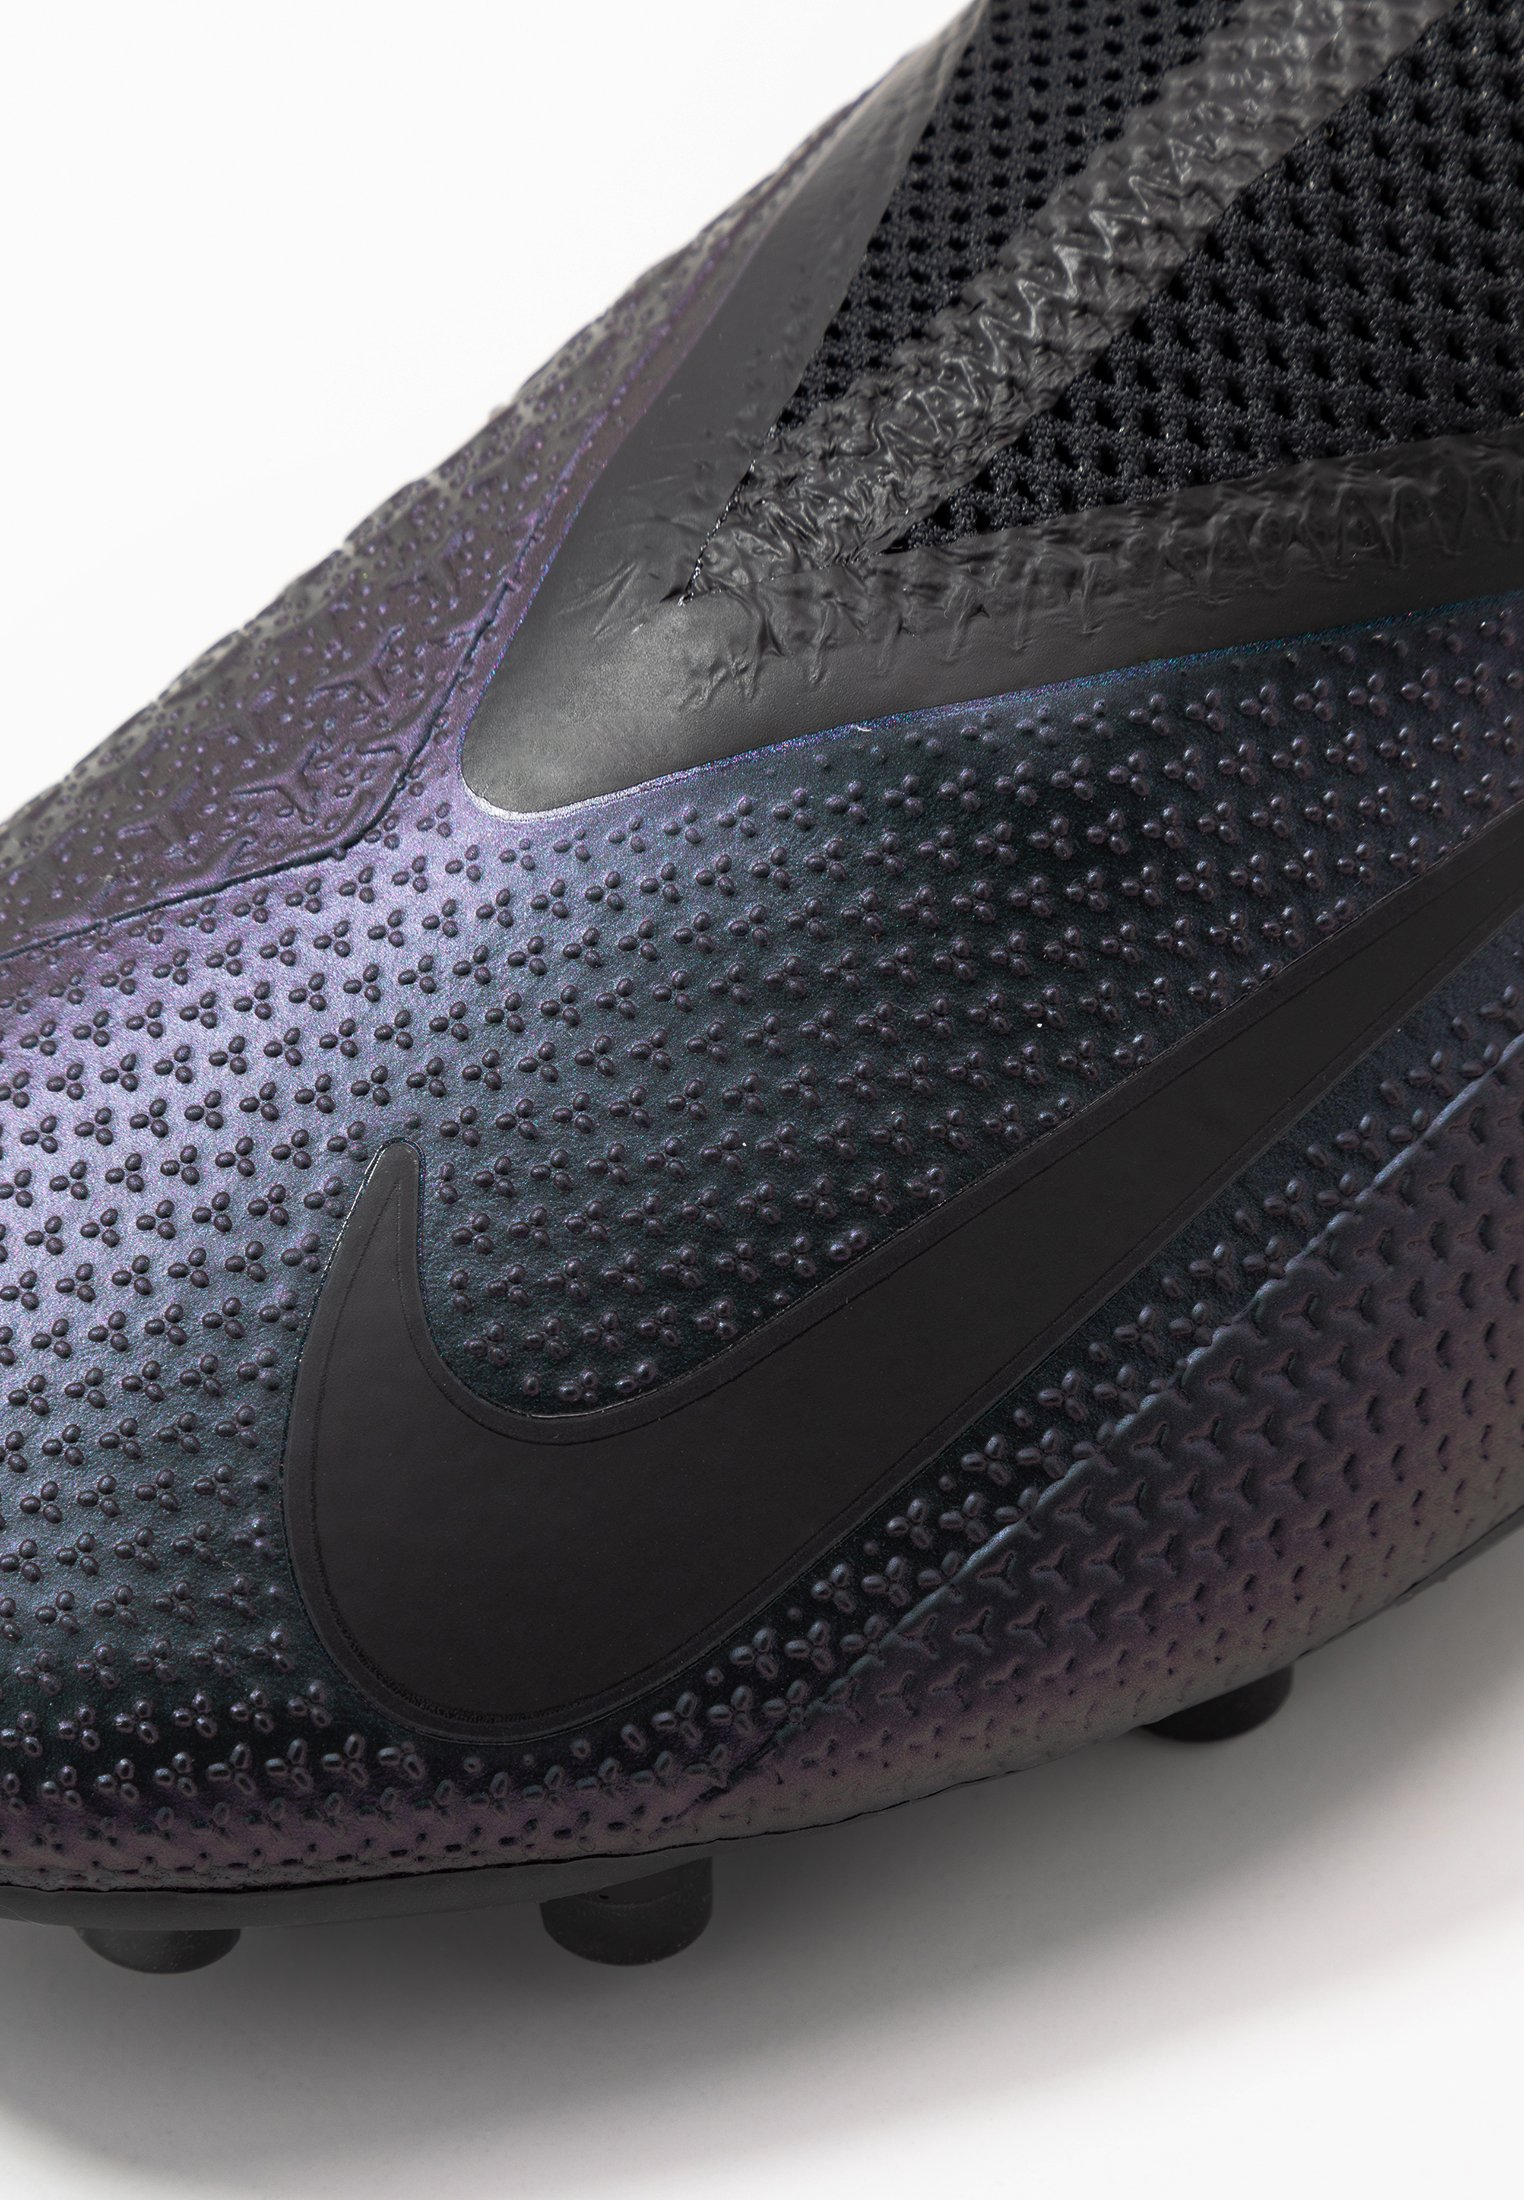 Nike Performance PHANTOM VISION 2 PRO DF FG Fotballsko